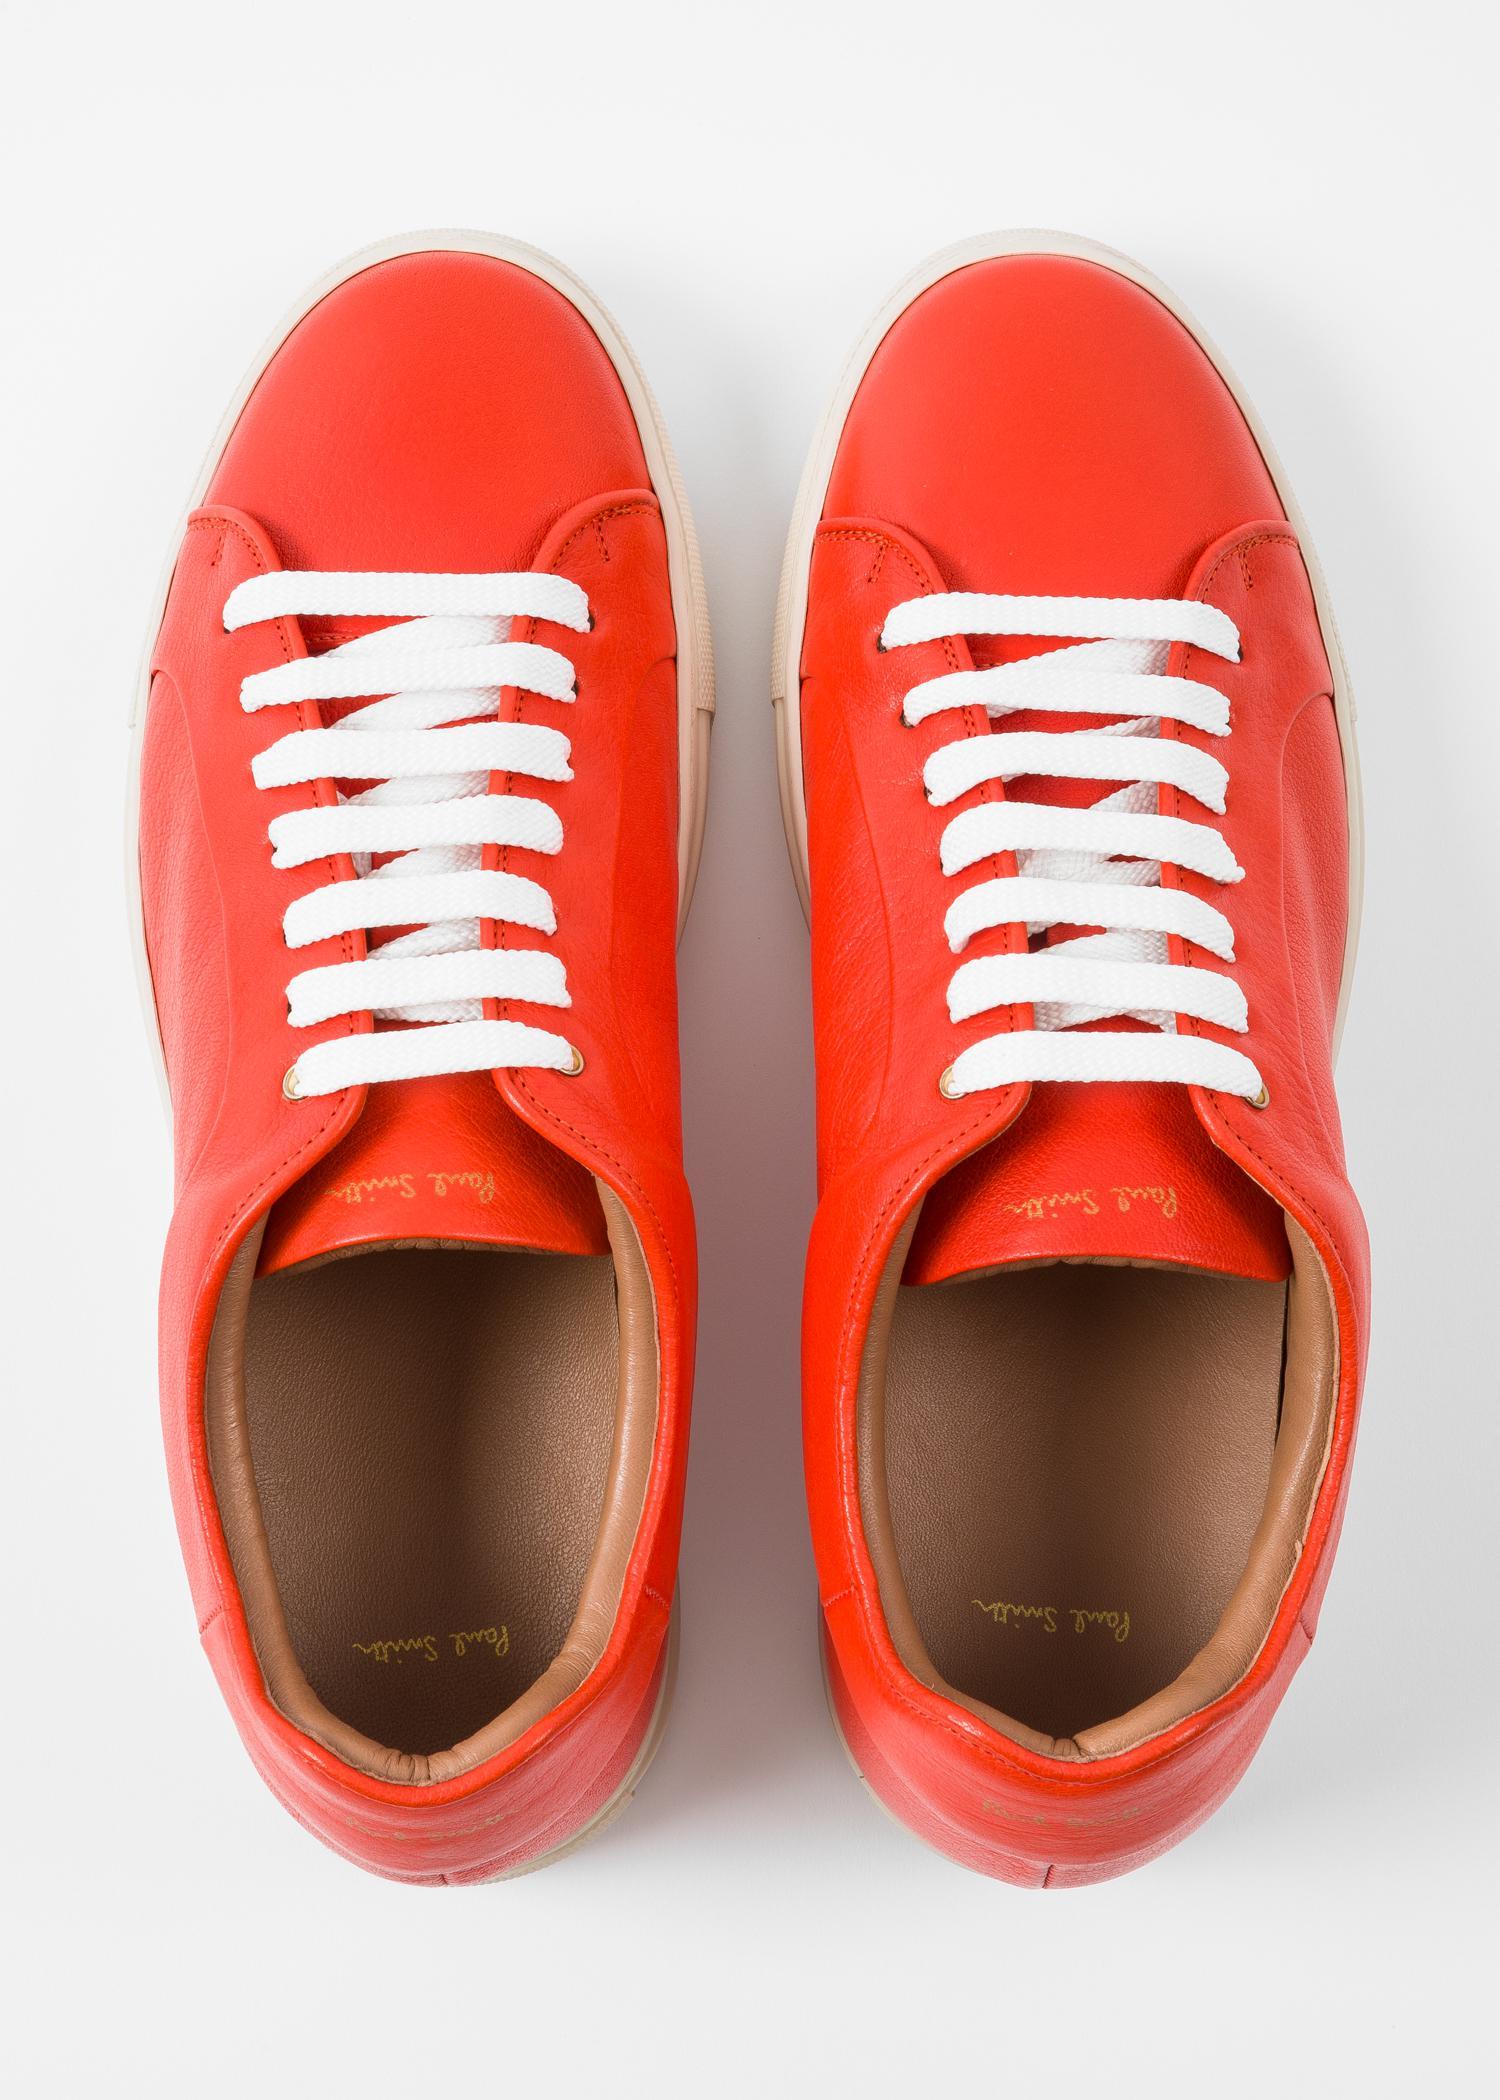 Paul Smith Burnt Orange Leather 'Basso